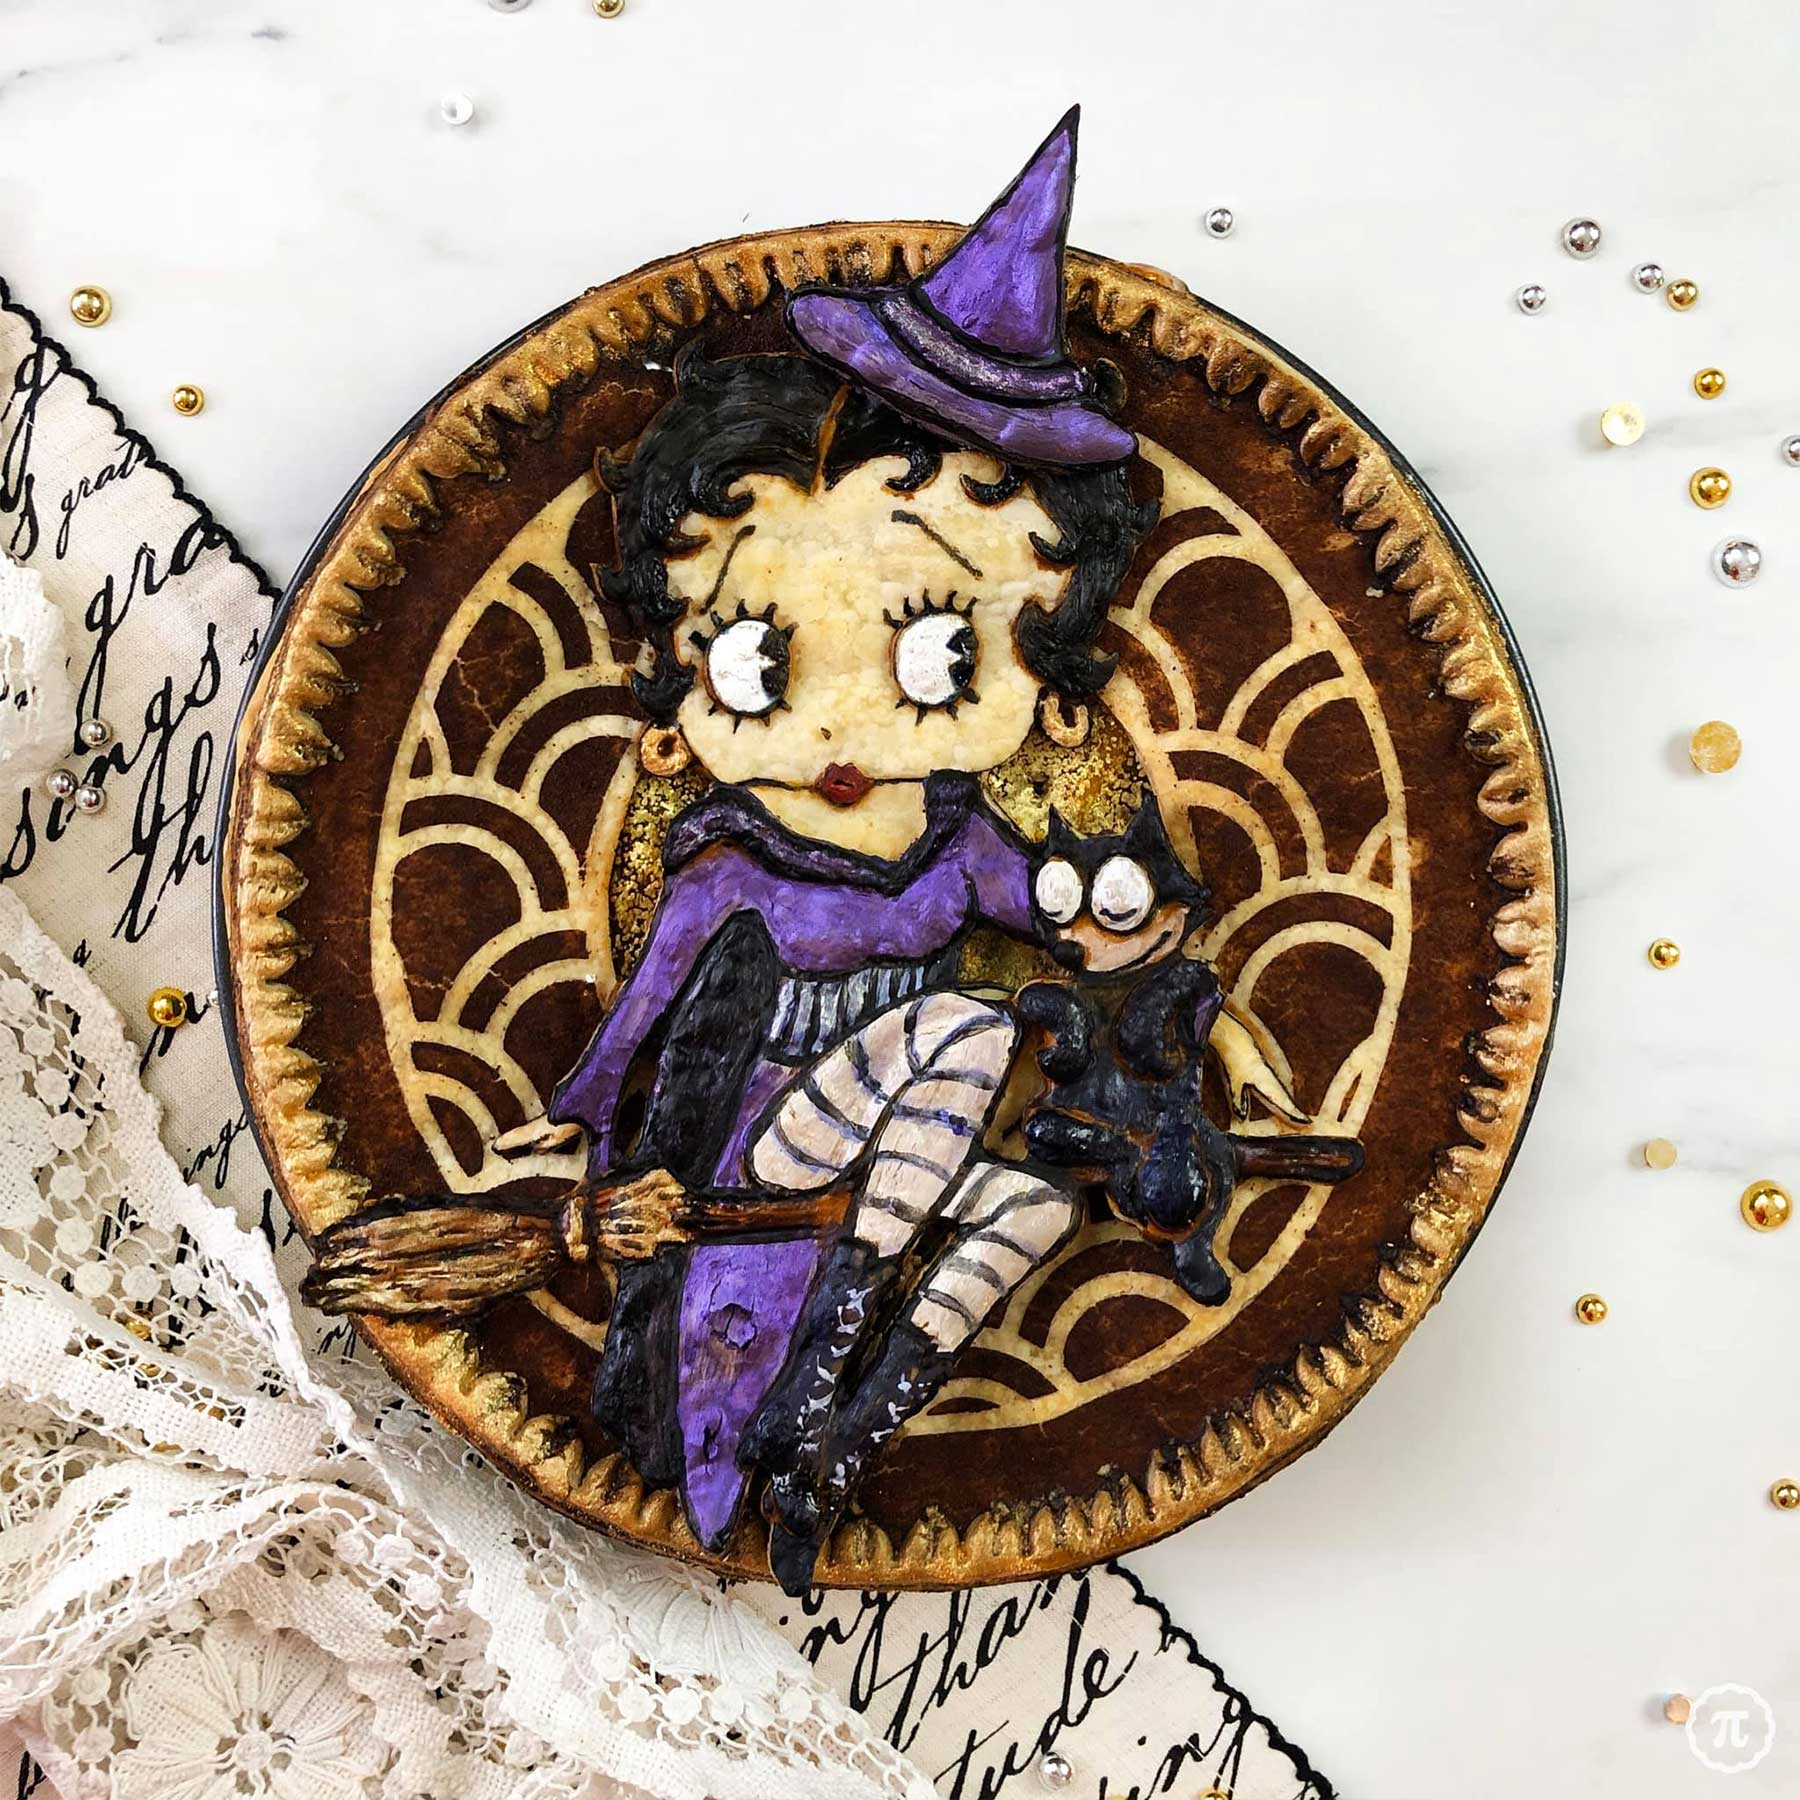 Kreative Kuchenkunst von Jessica Clark-Bojin piesareawesome-Jessica-Clark-Bojin_05